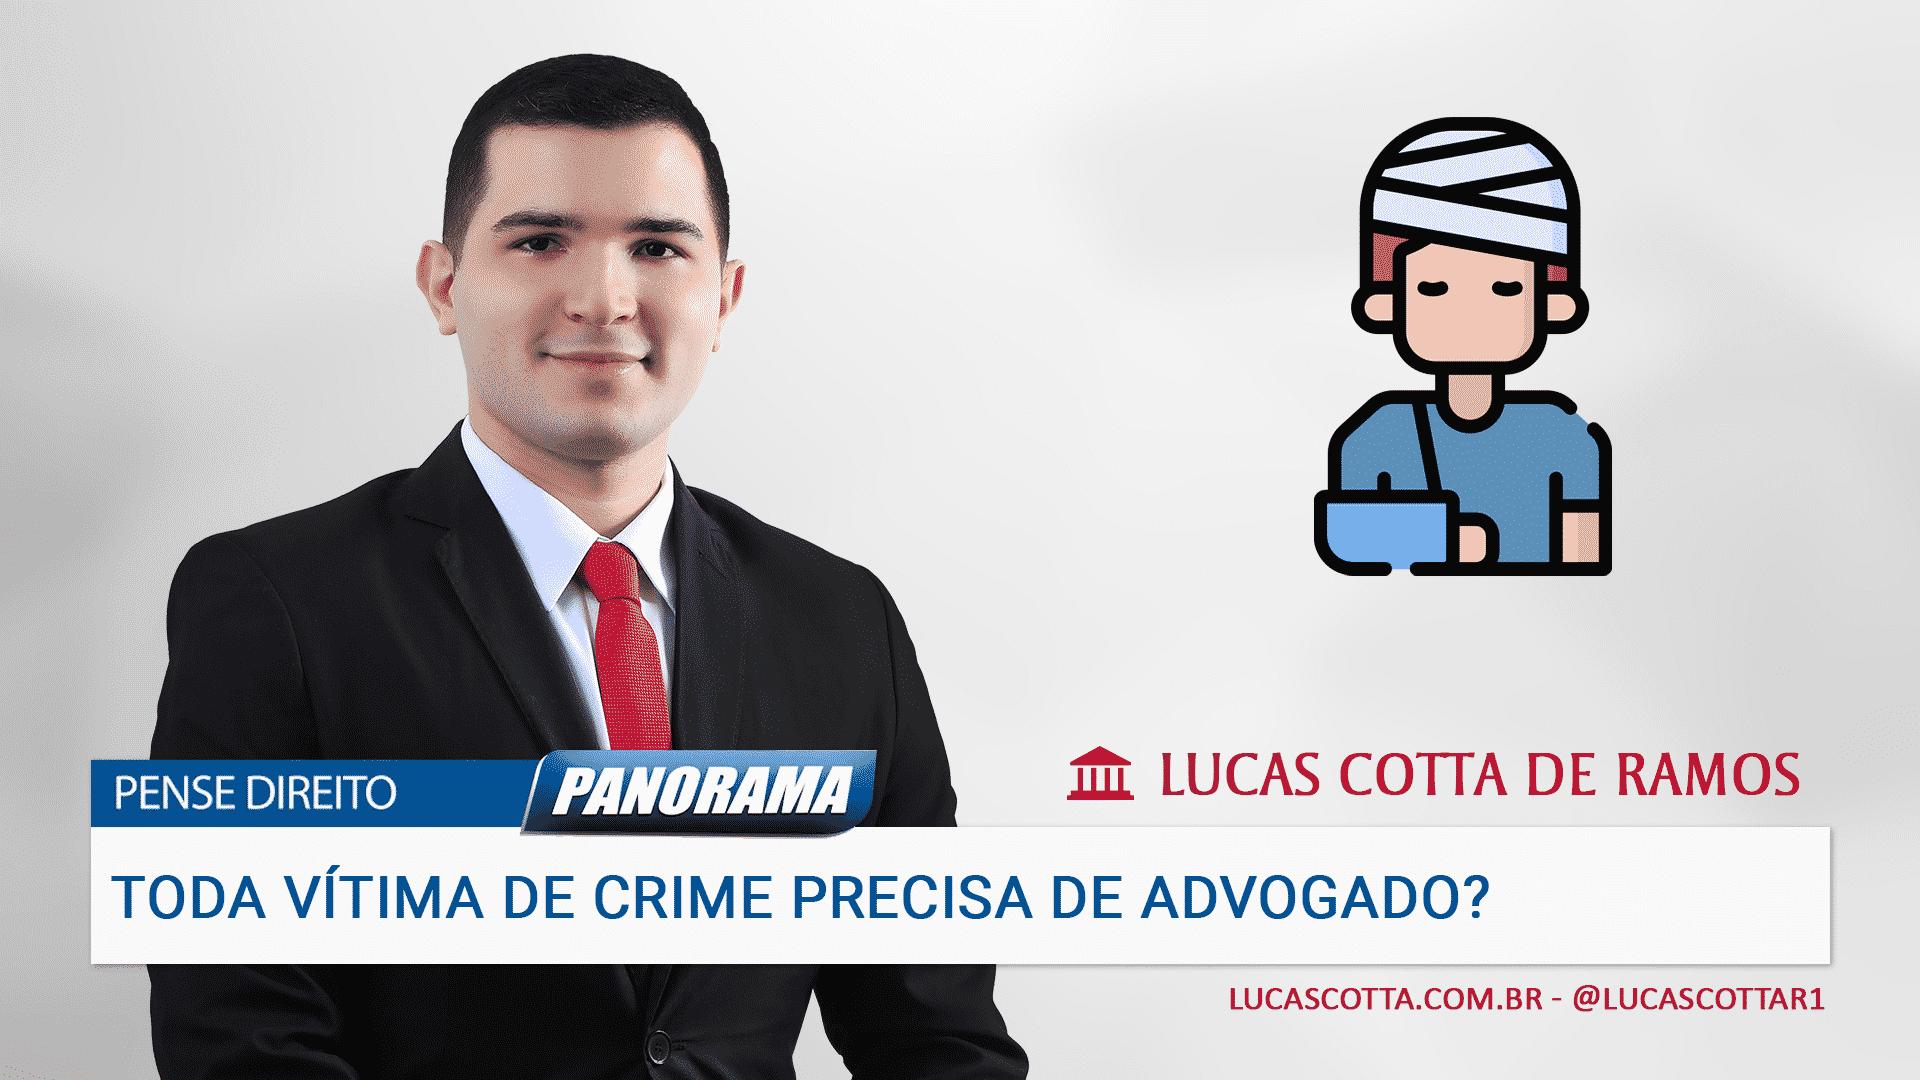 You are currently viewing Se fui vítima de crime, preciso contratar advogado?